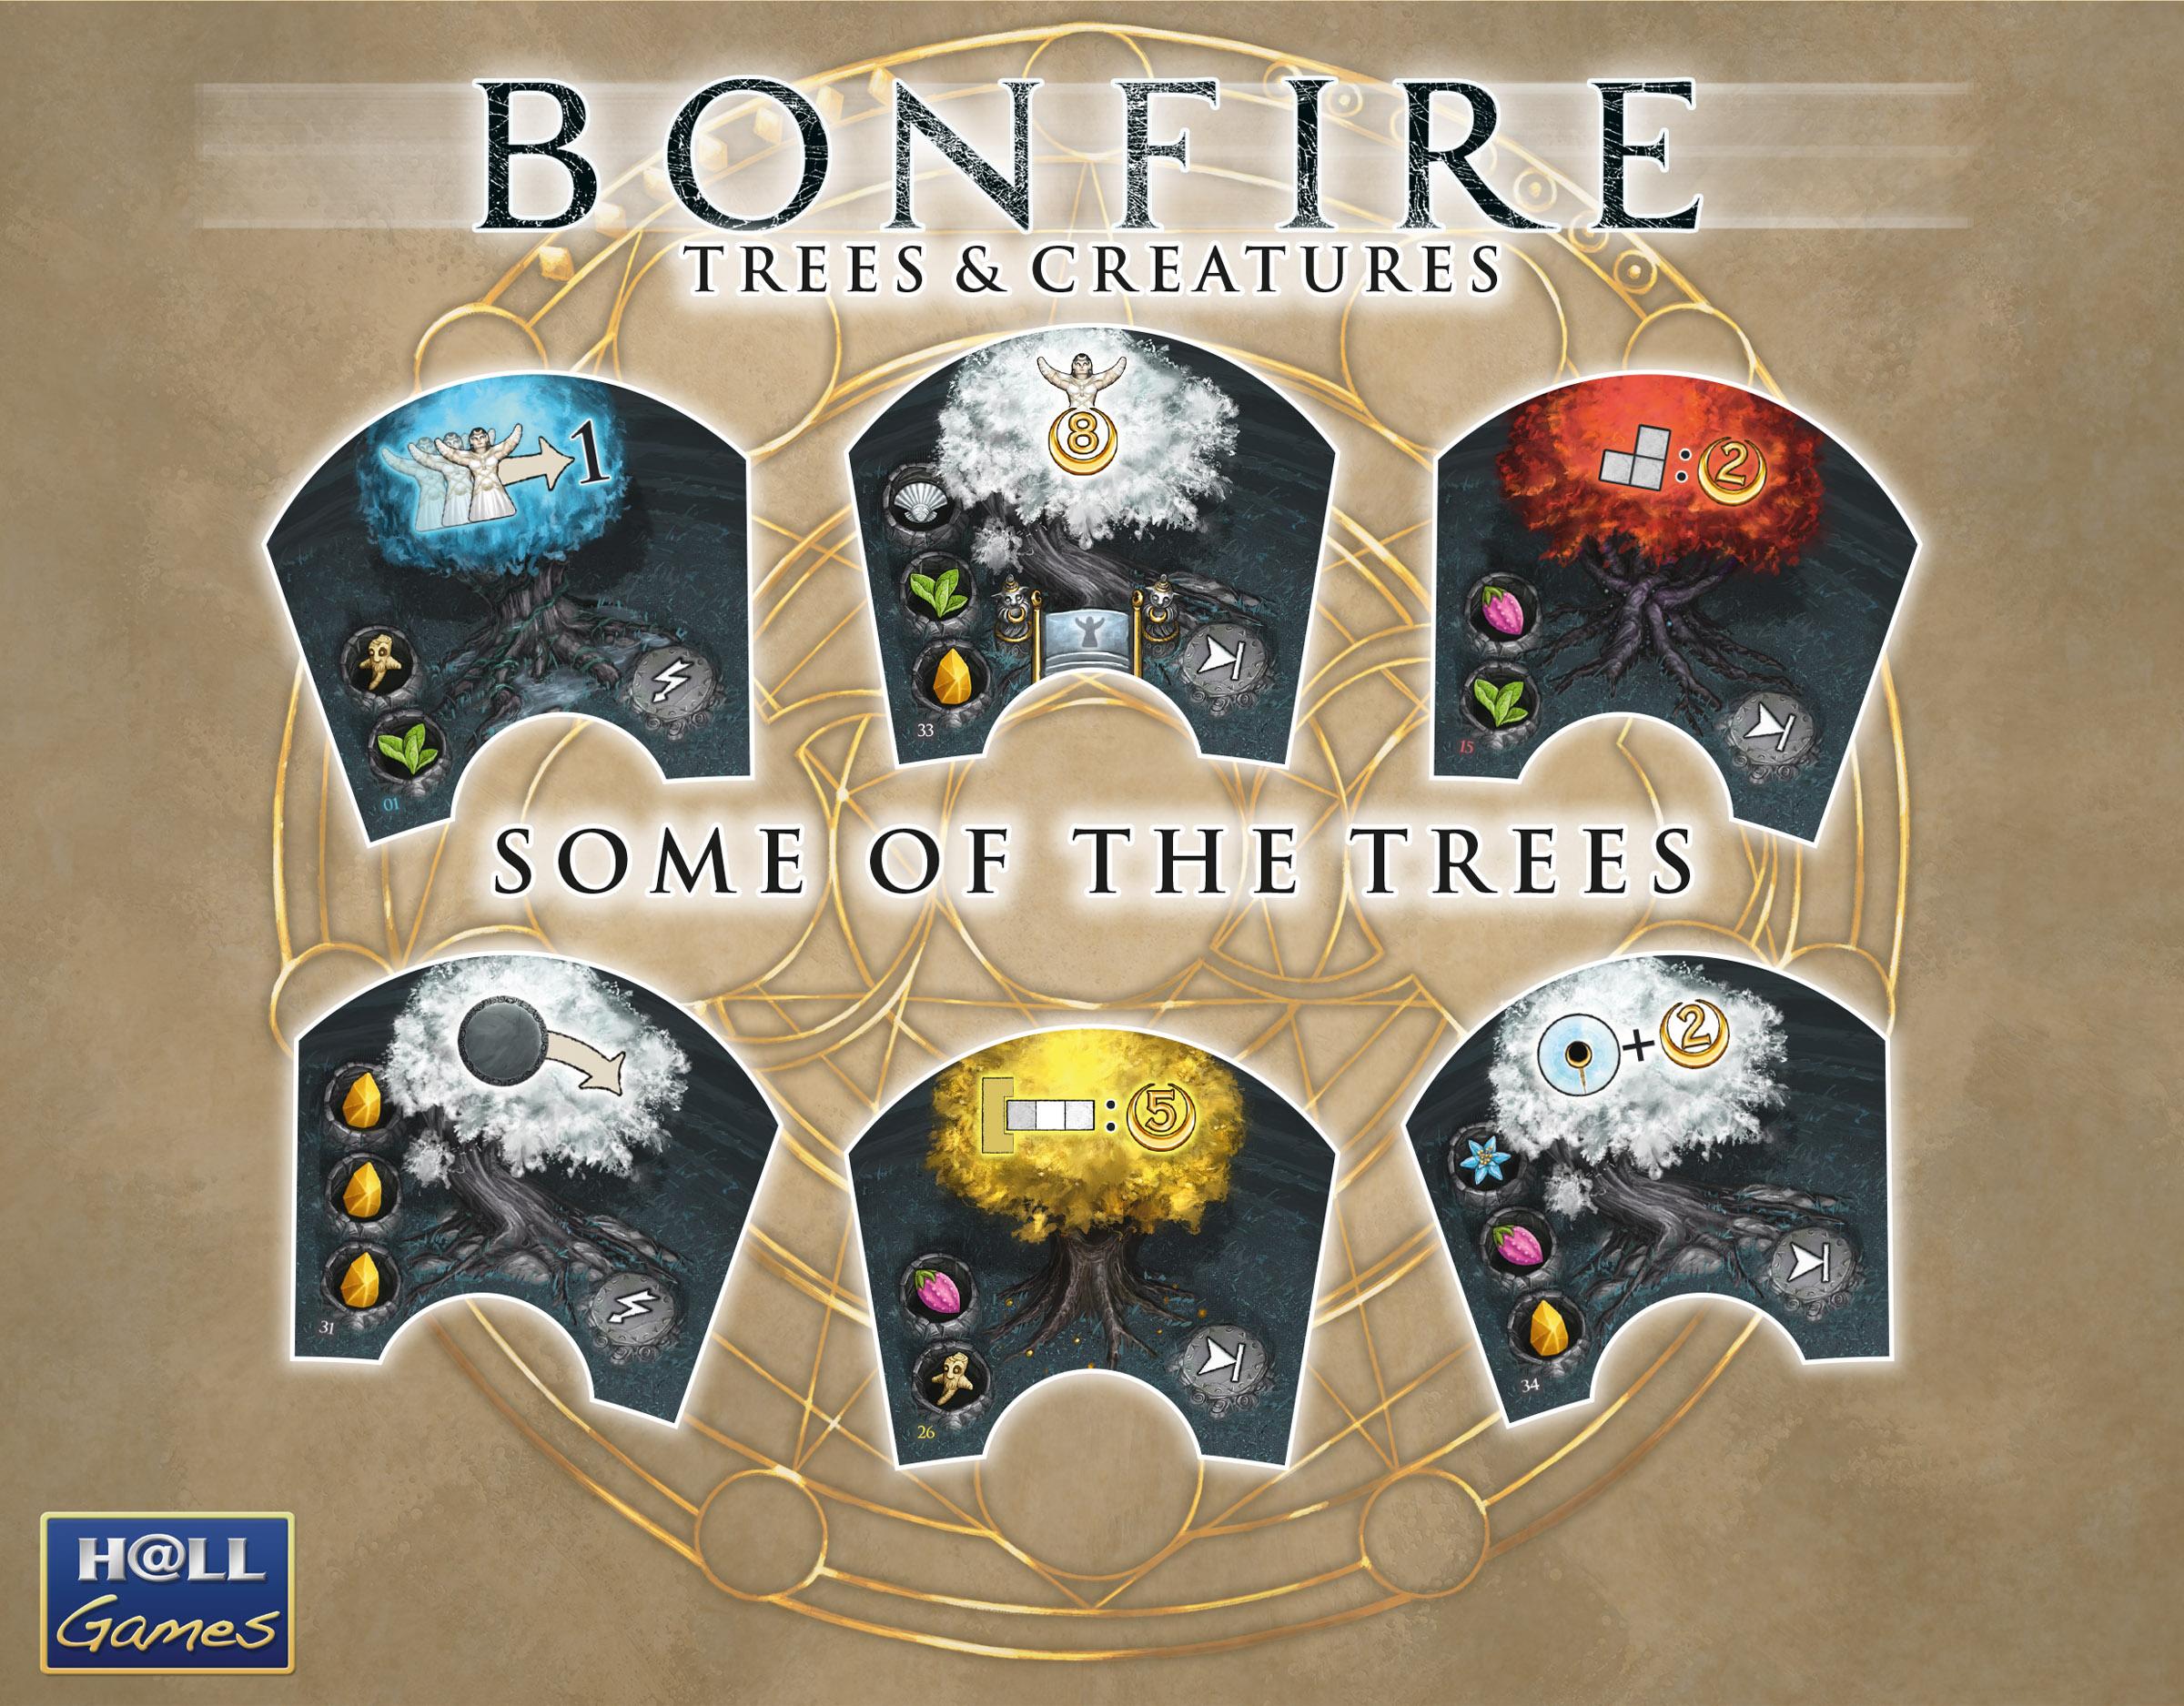 bonfire_treesandcreatures_trees